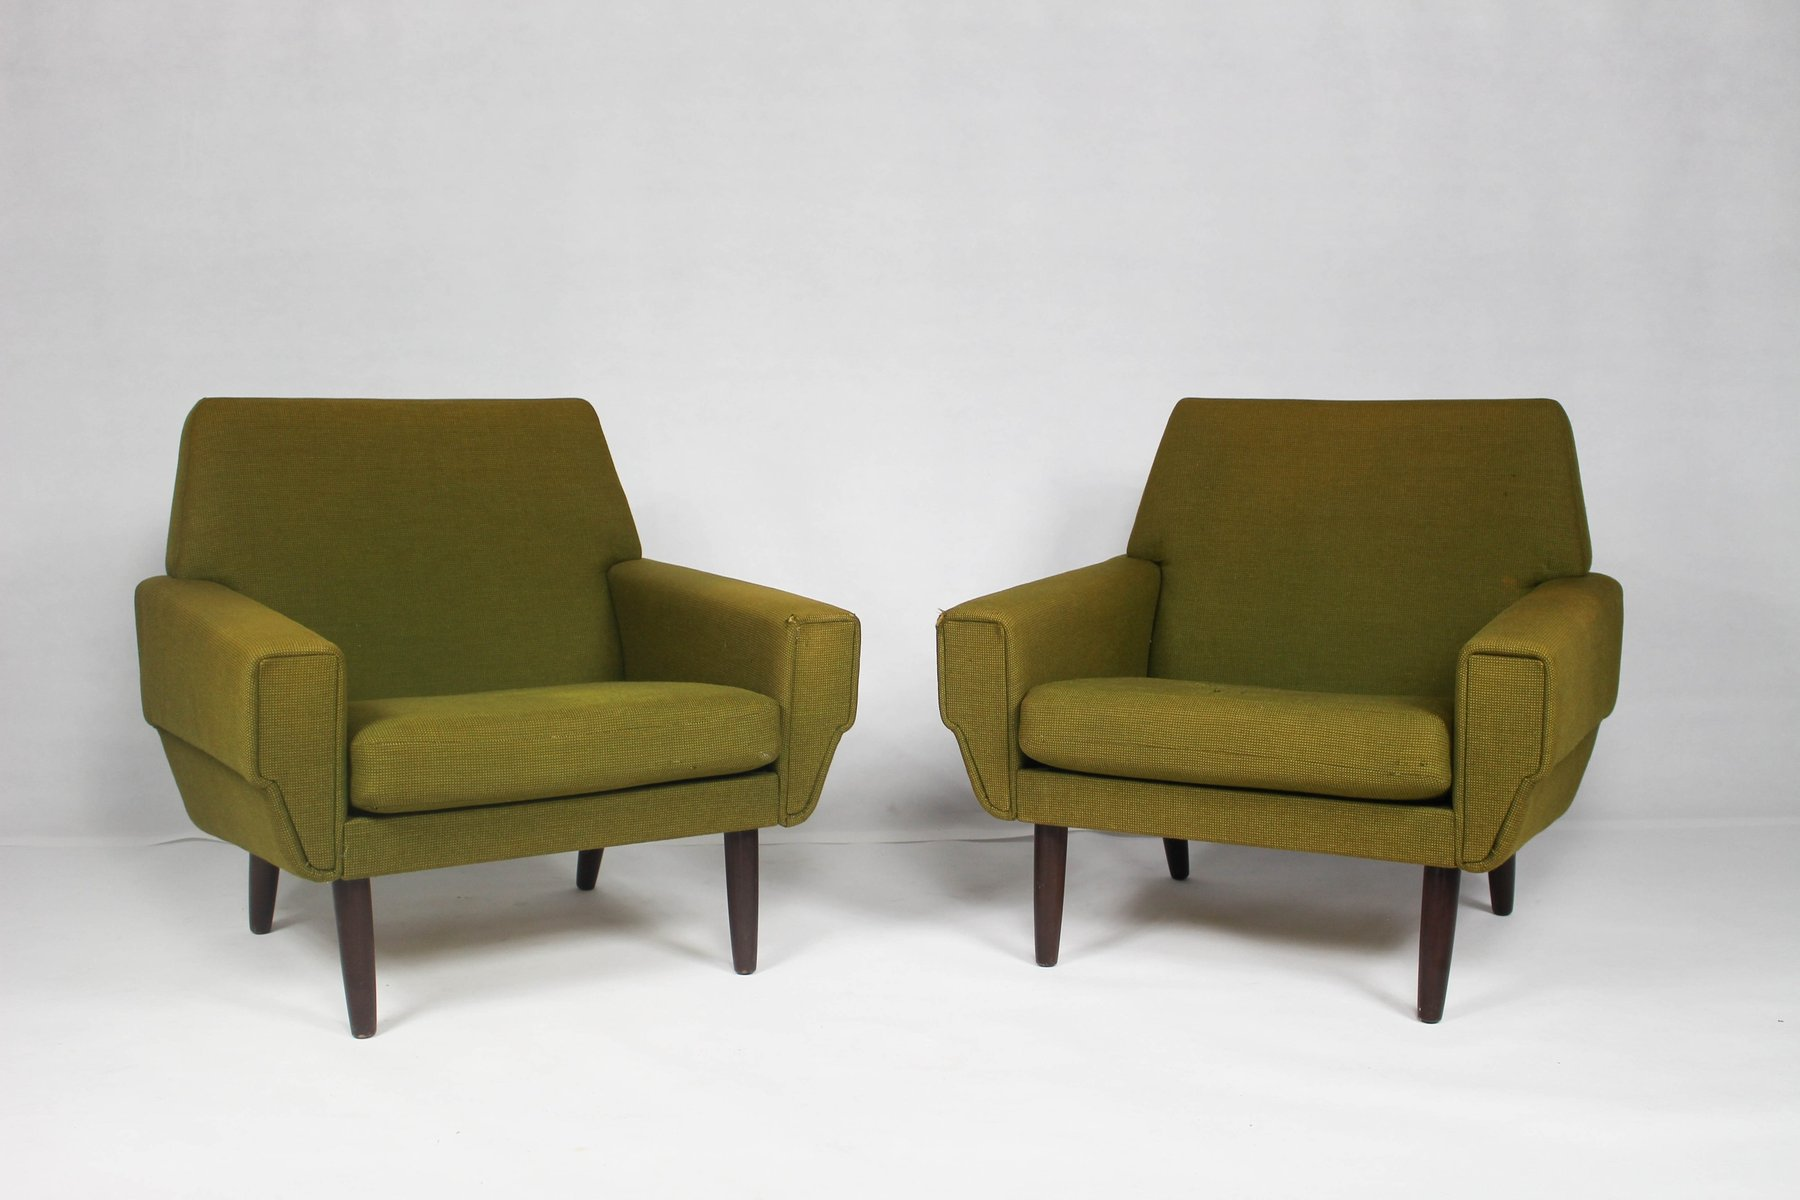 d nischer mid century sessel 2er set bei pamono kaufen. Black Bedroom Furniture Sets. Home Design Ideas